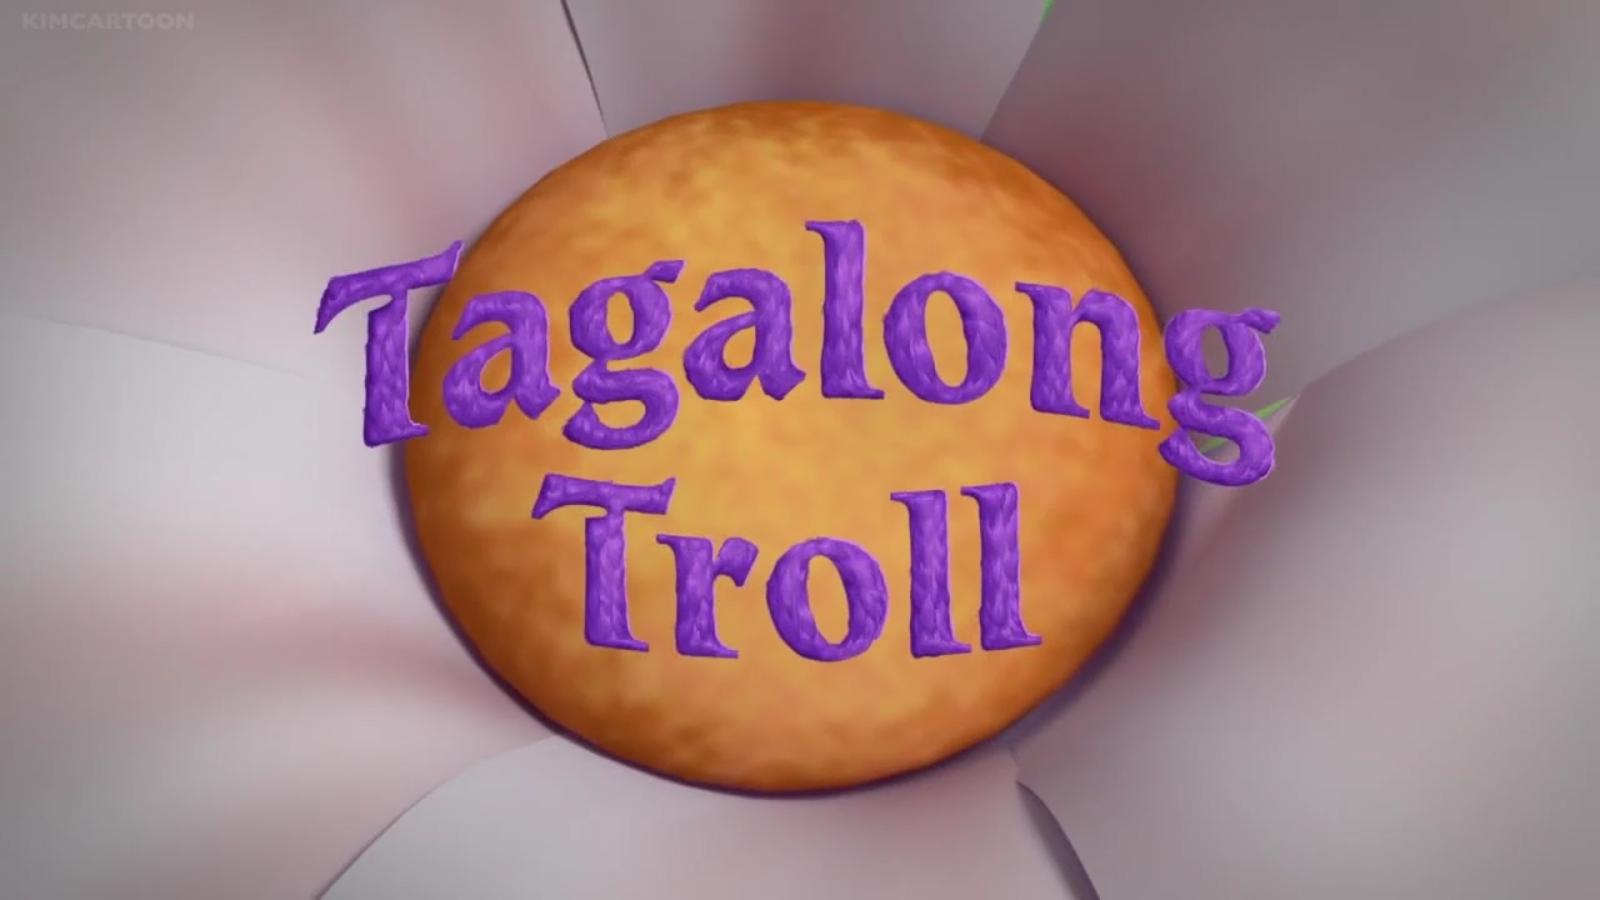 Tagalong Troll